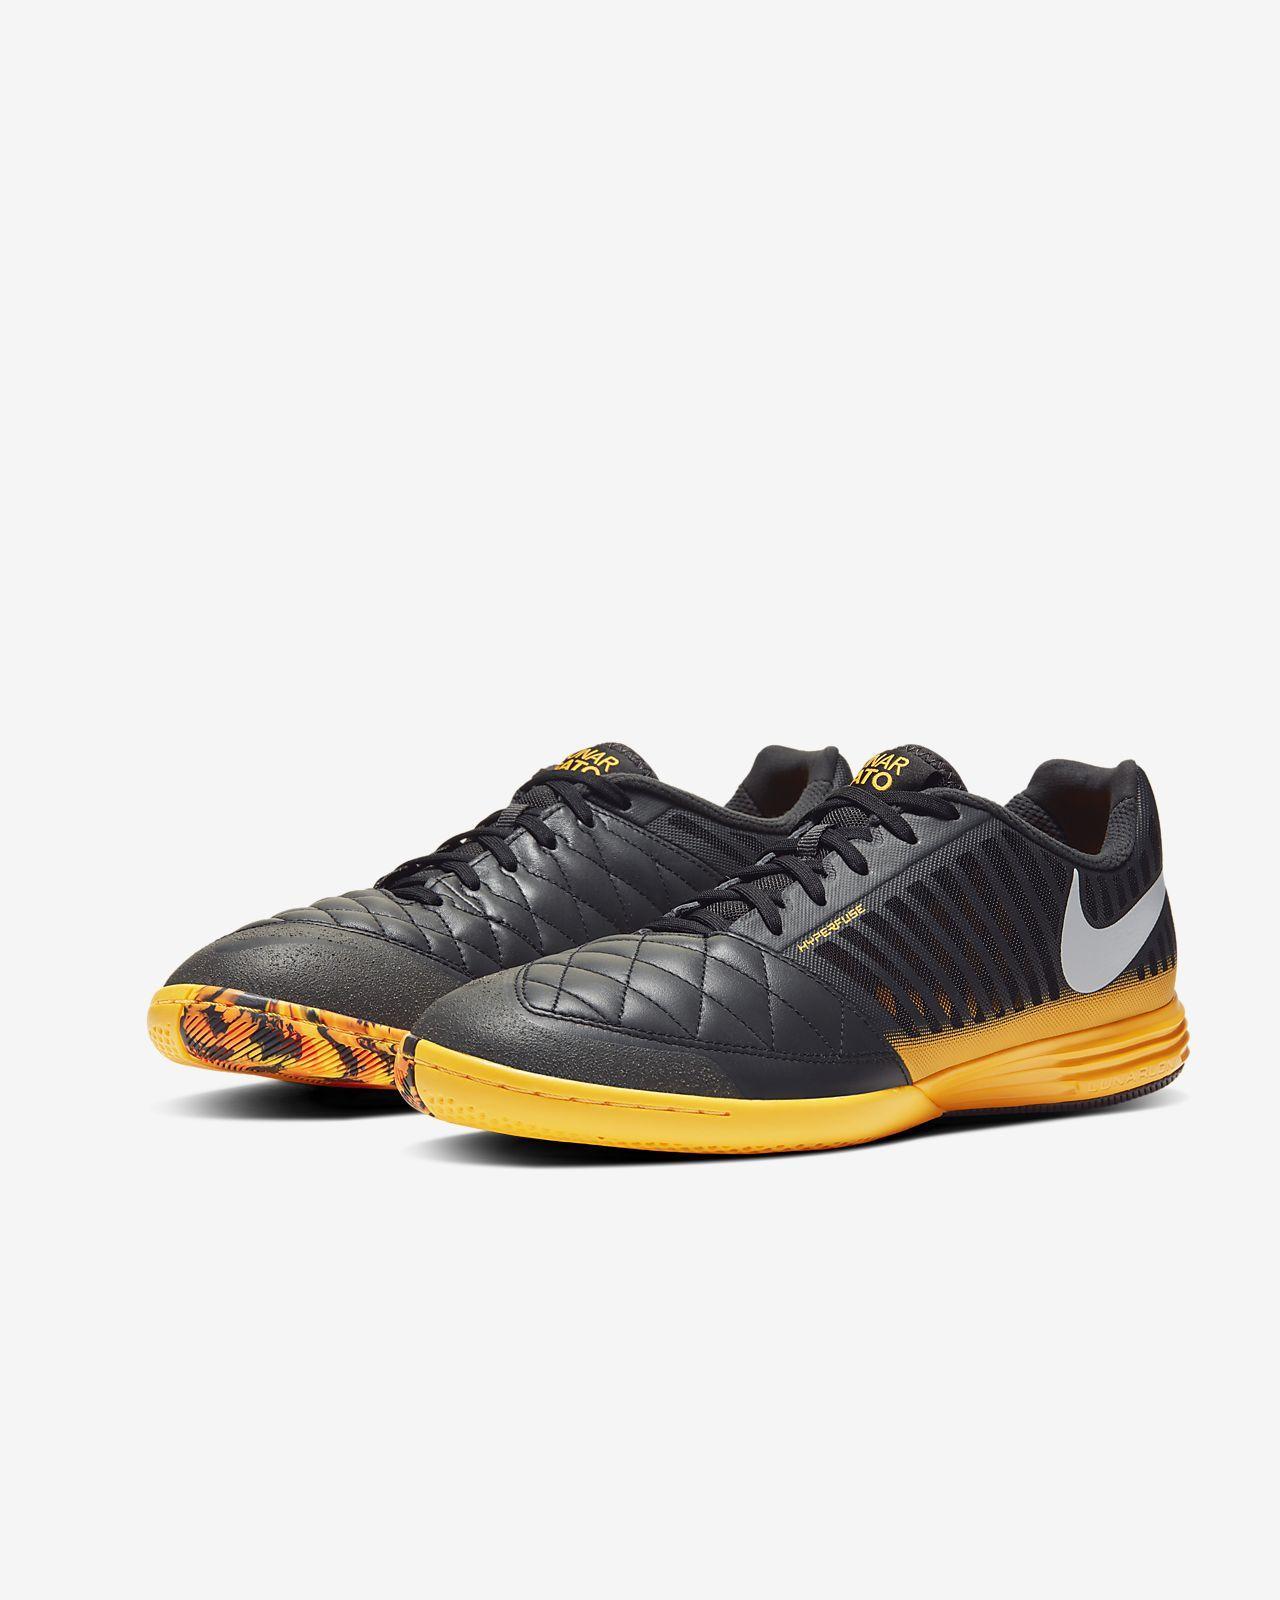 Nike Lunargato II Baratas | Sapatilhas Nike Outlet Online